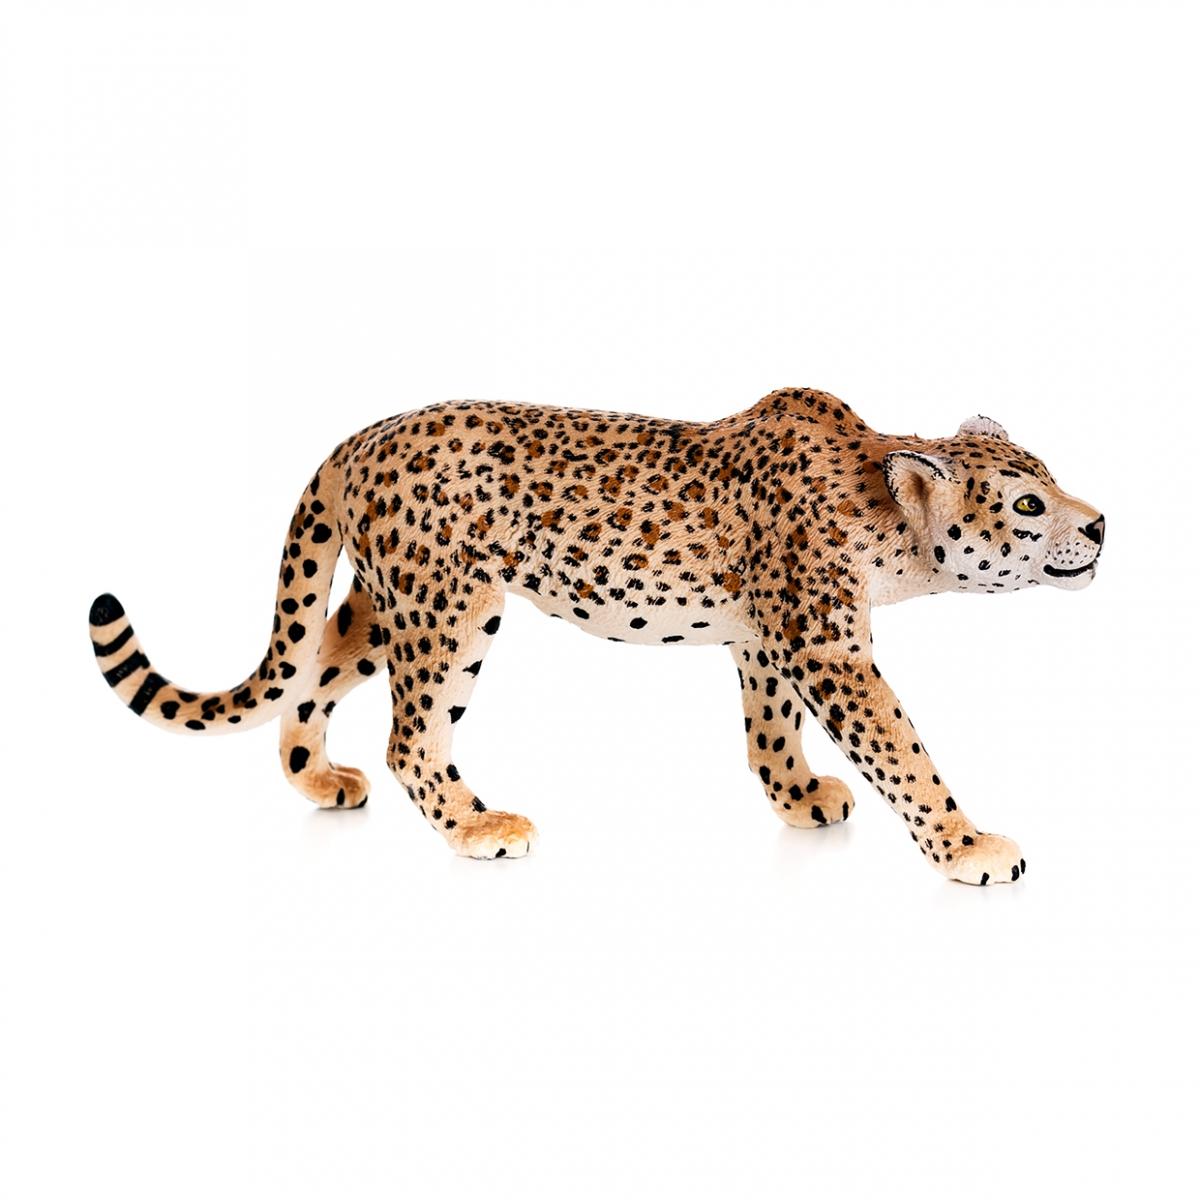 Imagen de un leopardo